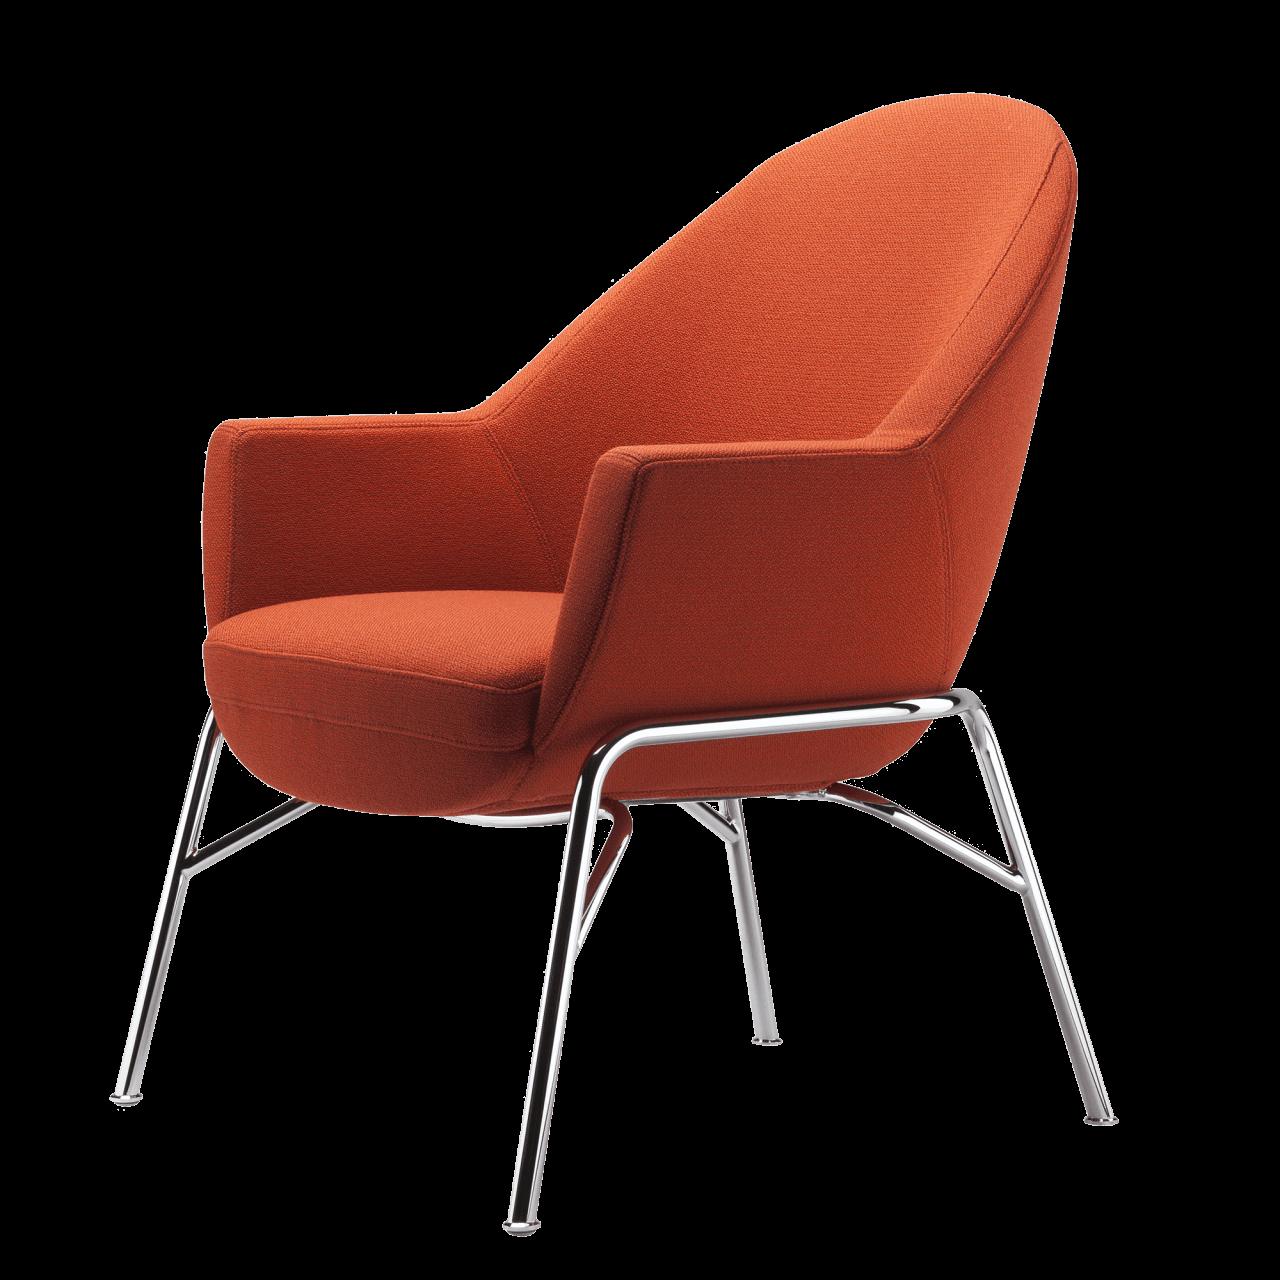 S 831 Sessel